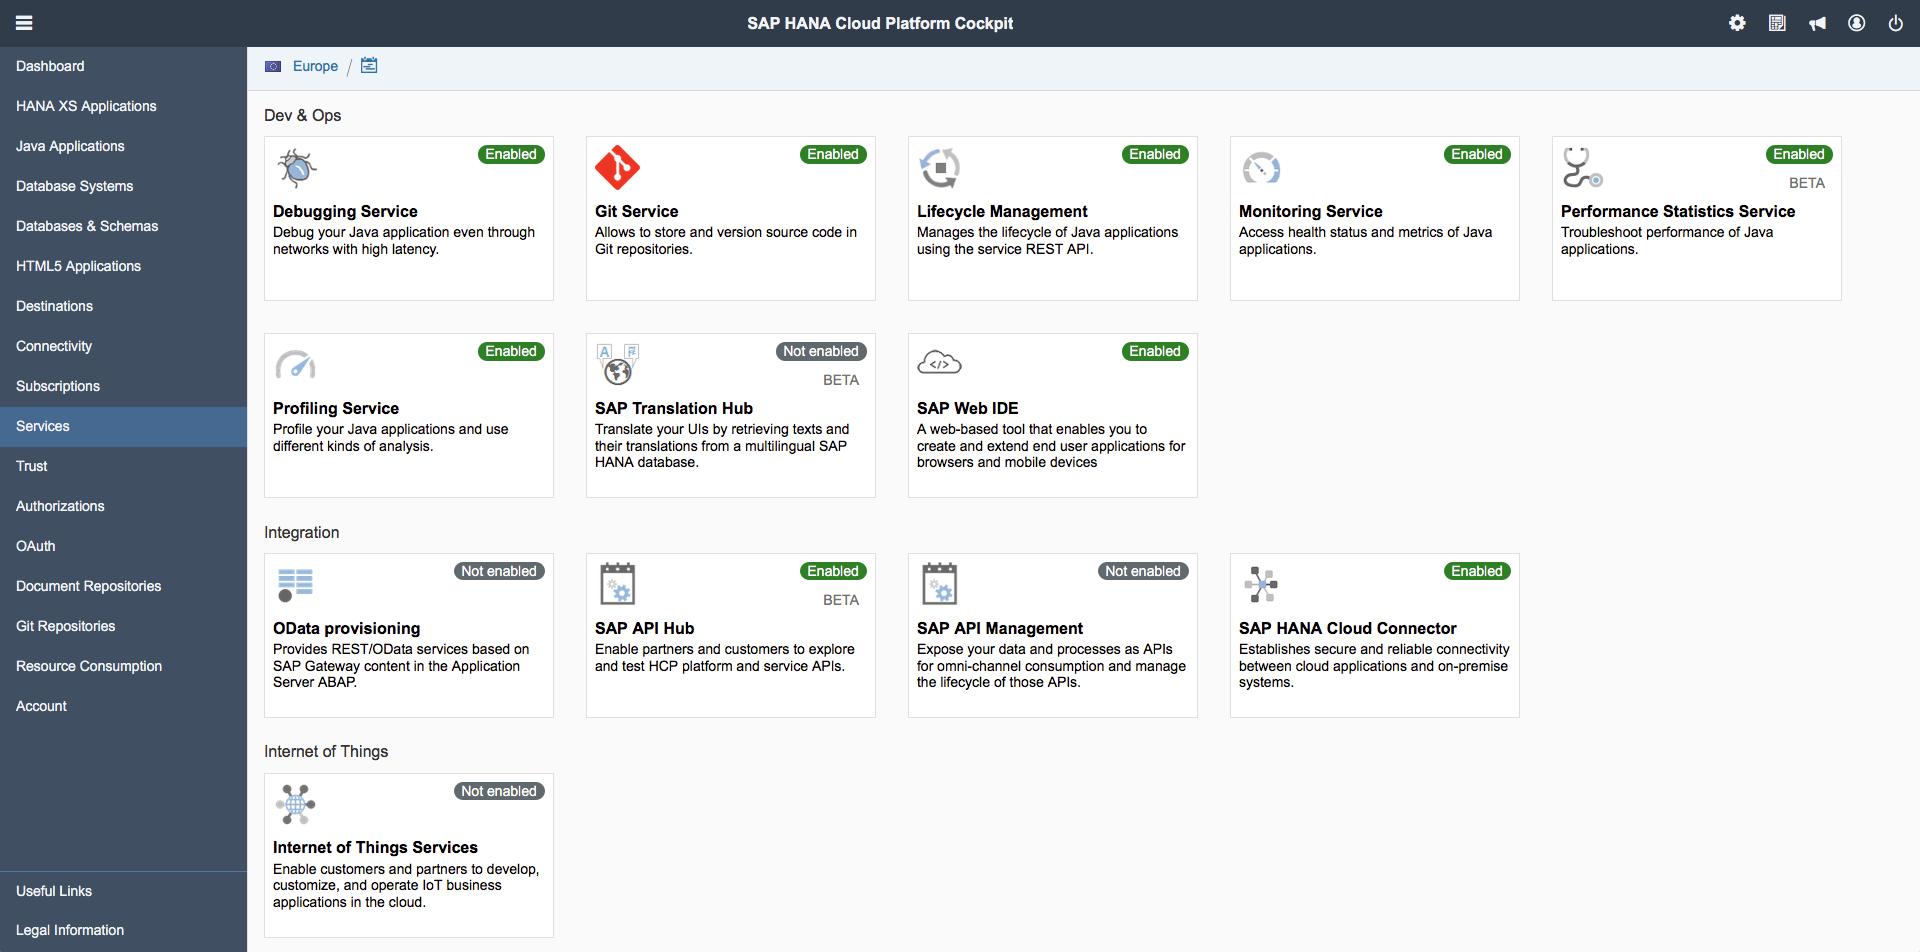 SAP HANA Cloud Platform cockpit